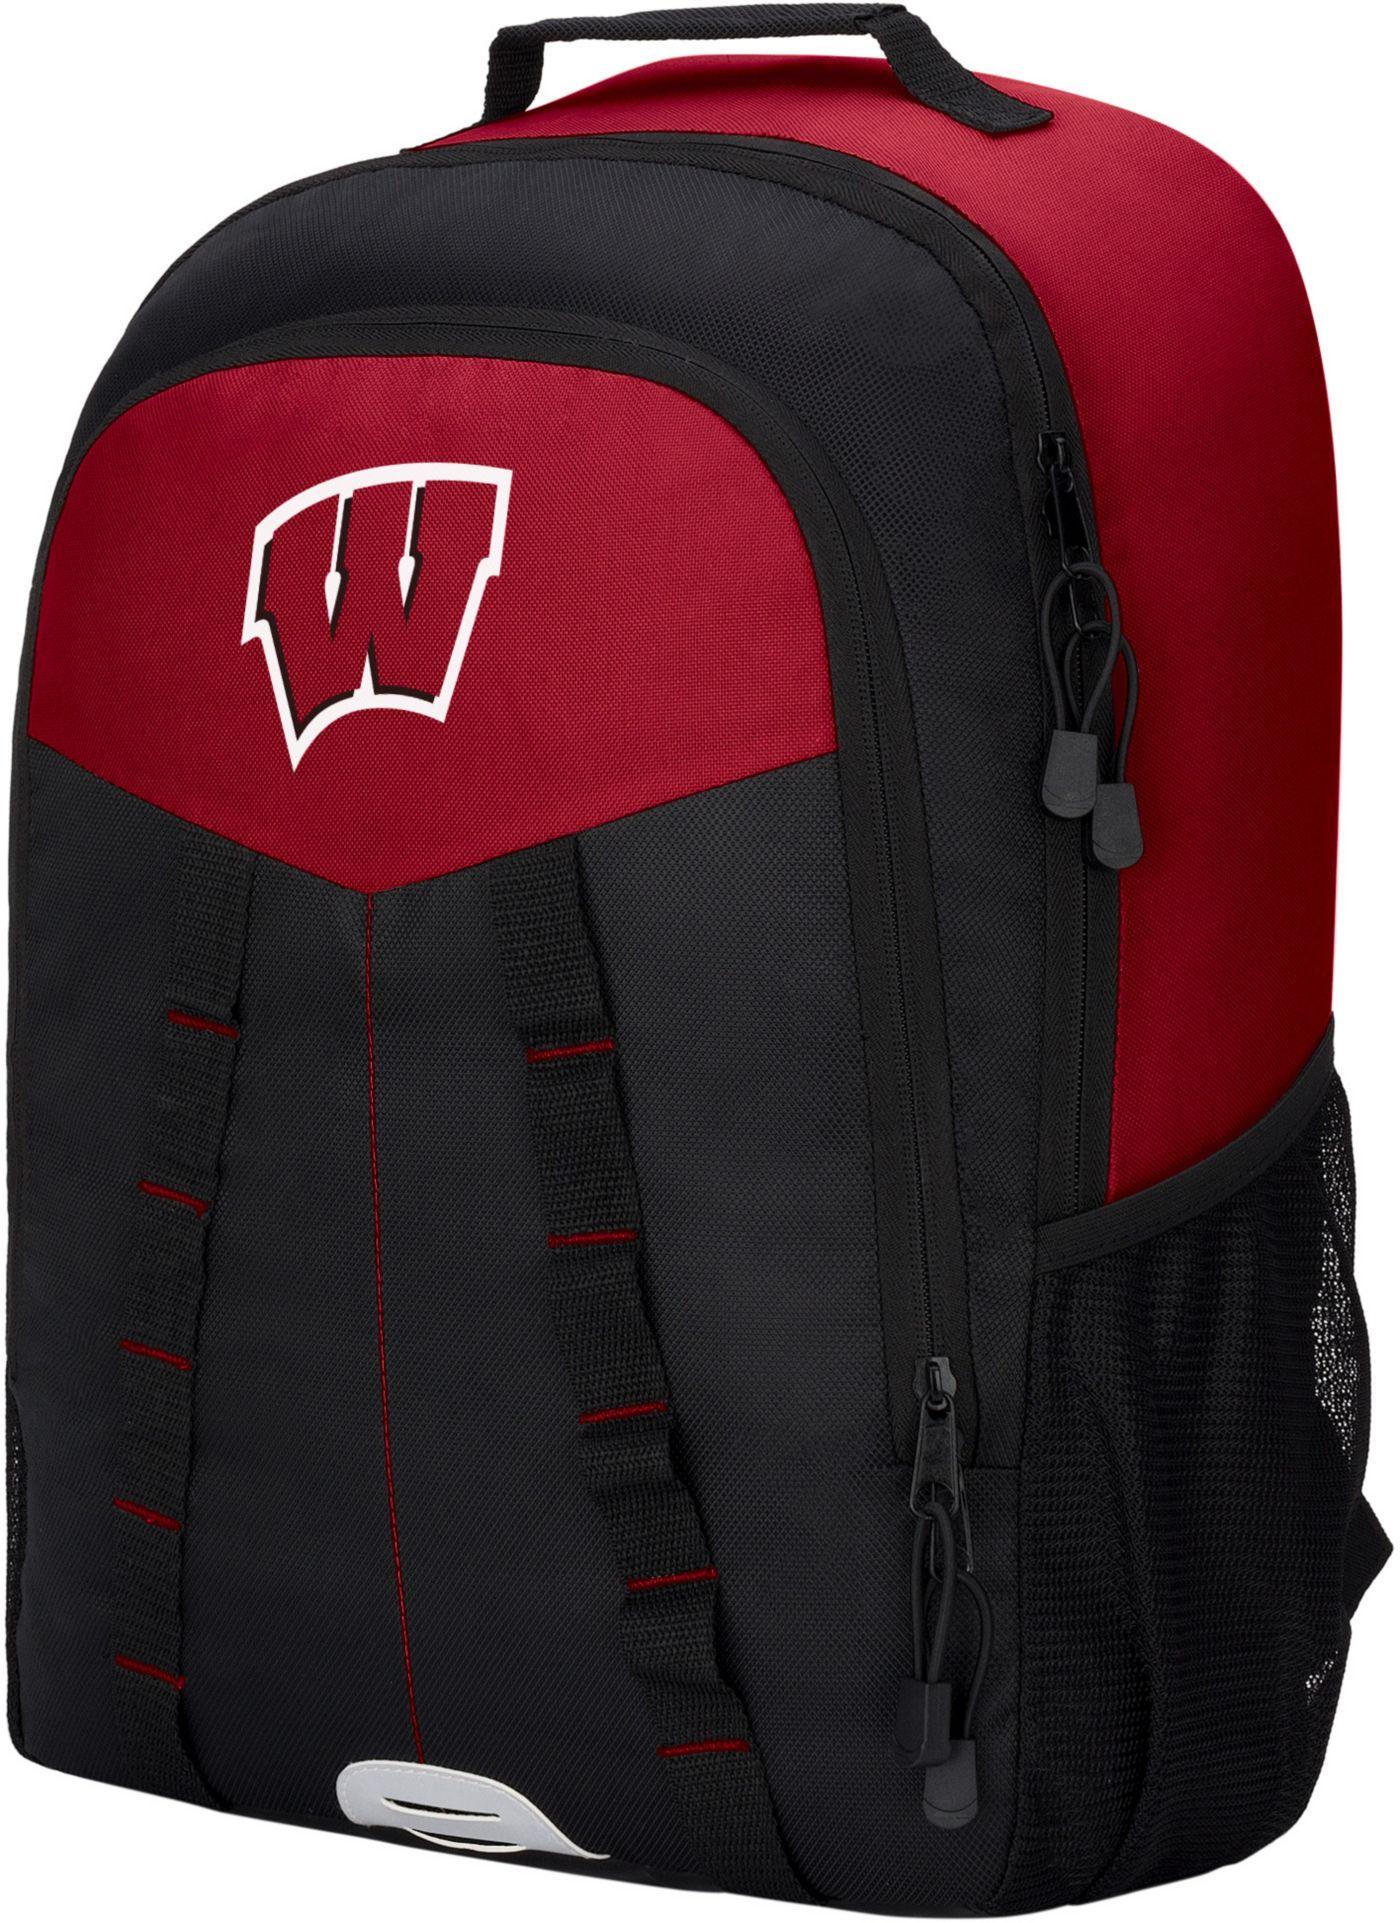 Northwest Wisconsin Badgers Scorcher Backpack